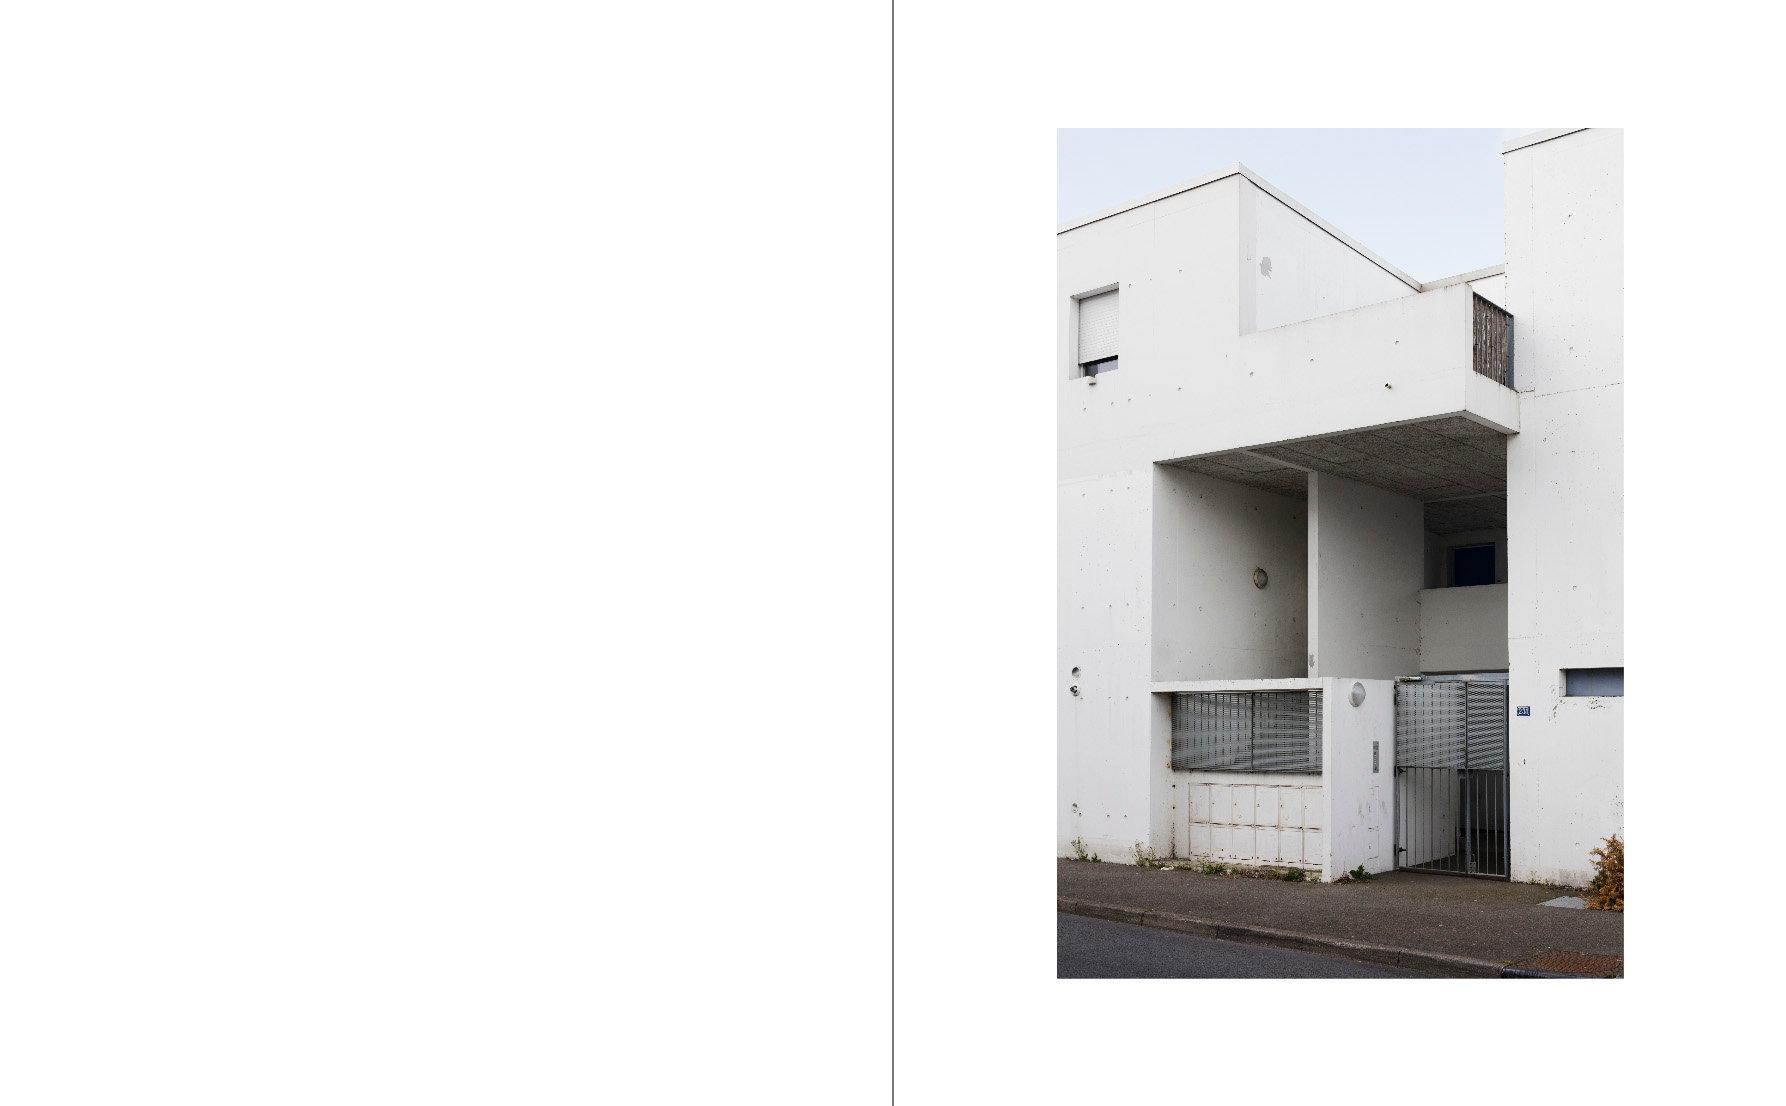 Trignac_Saint-Nazaire-page029.jpg